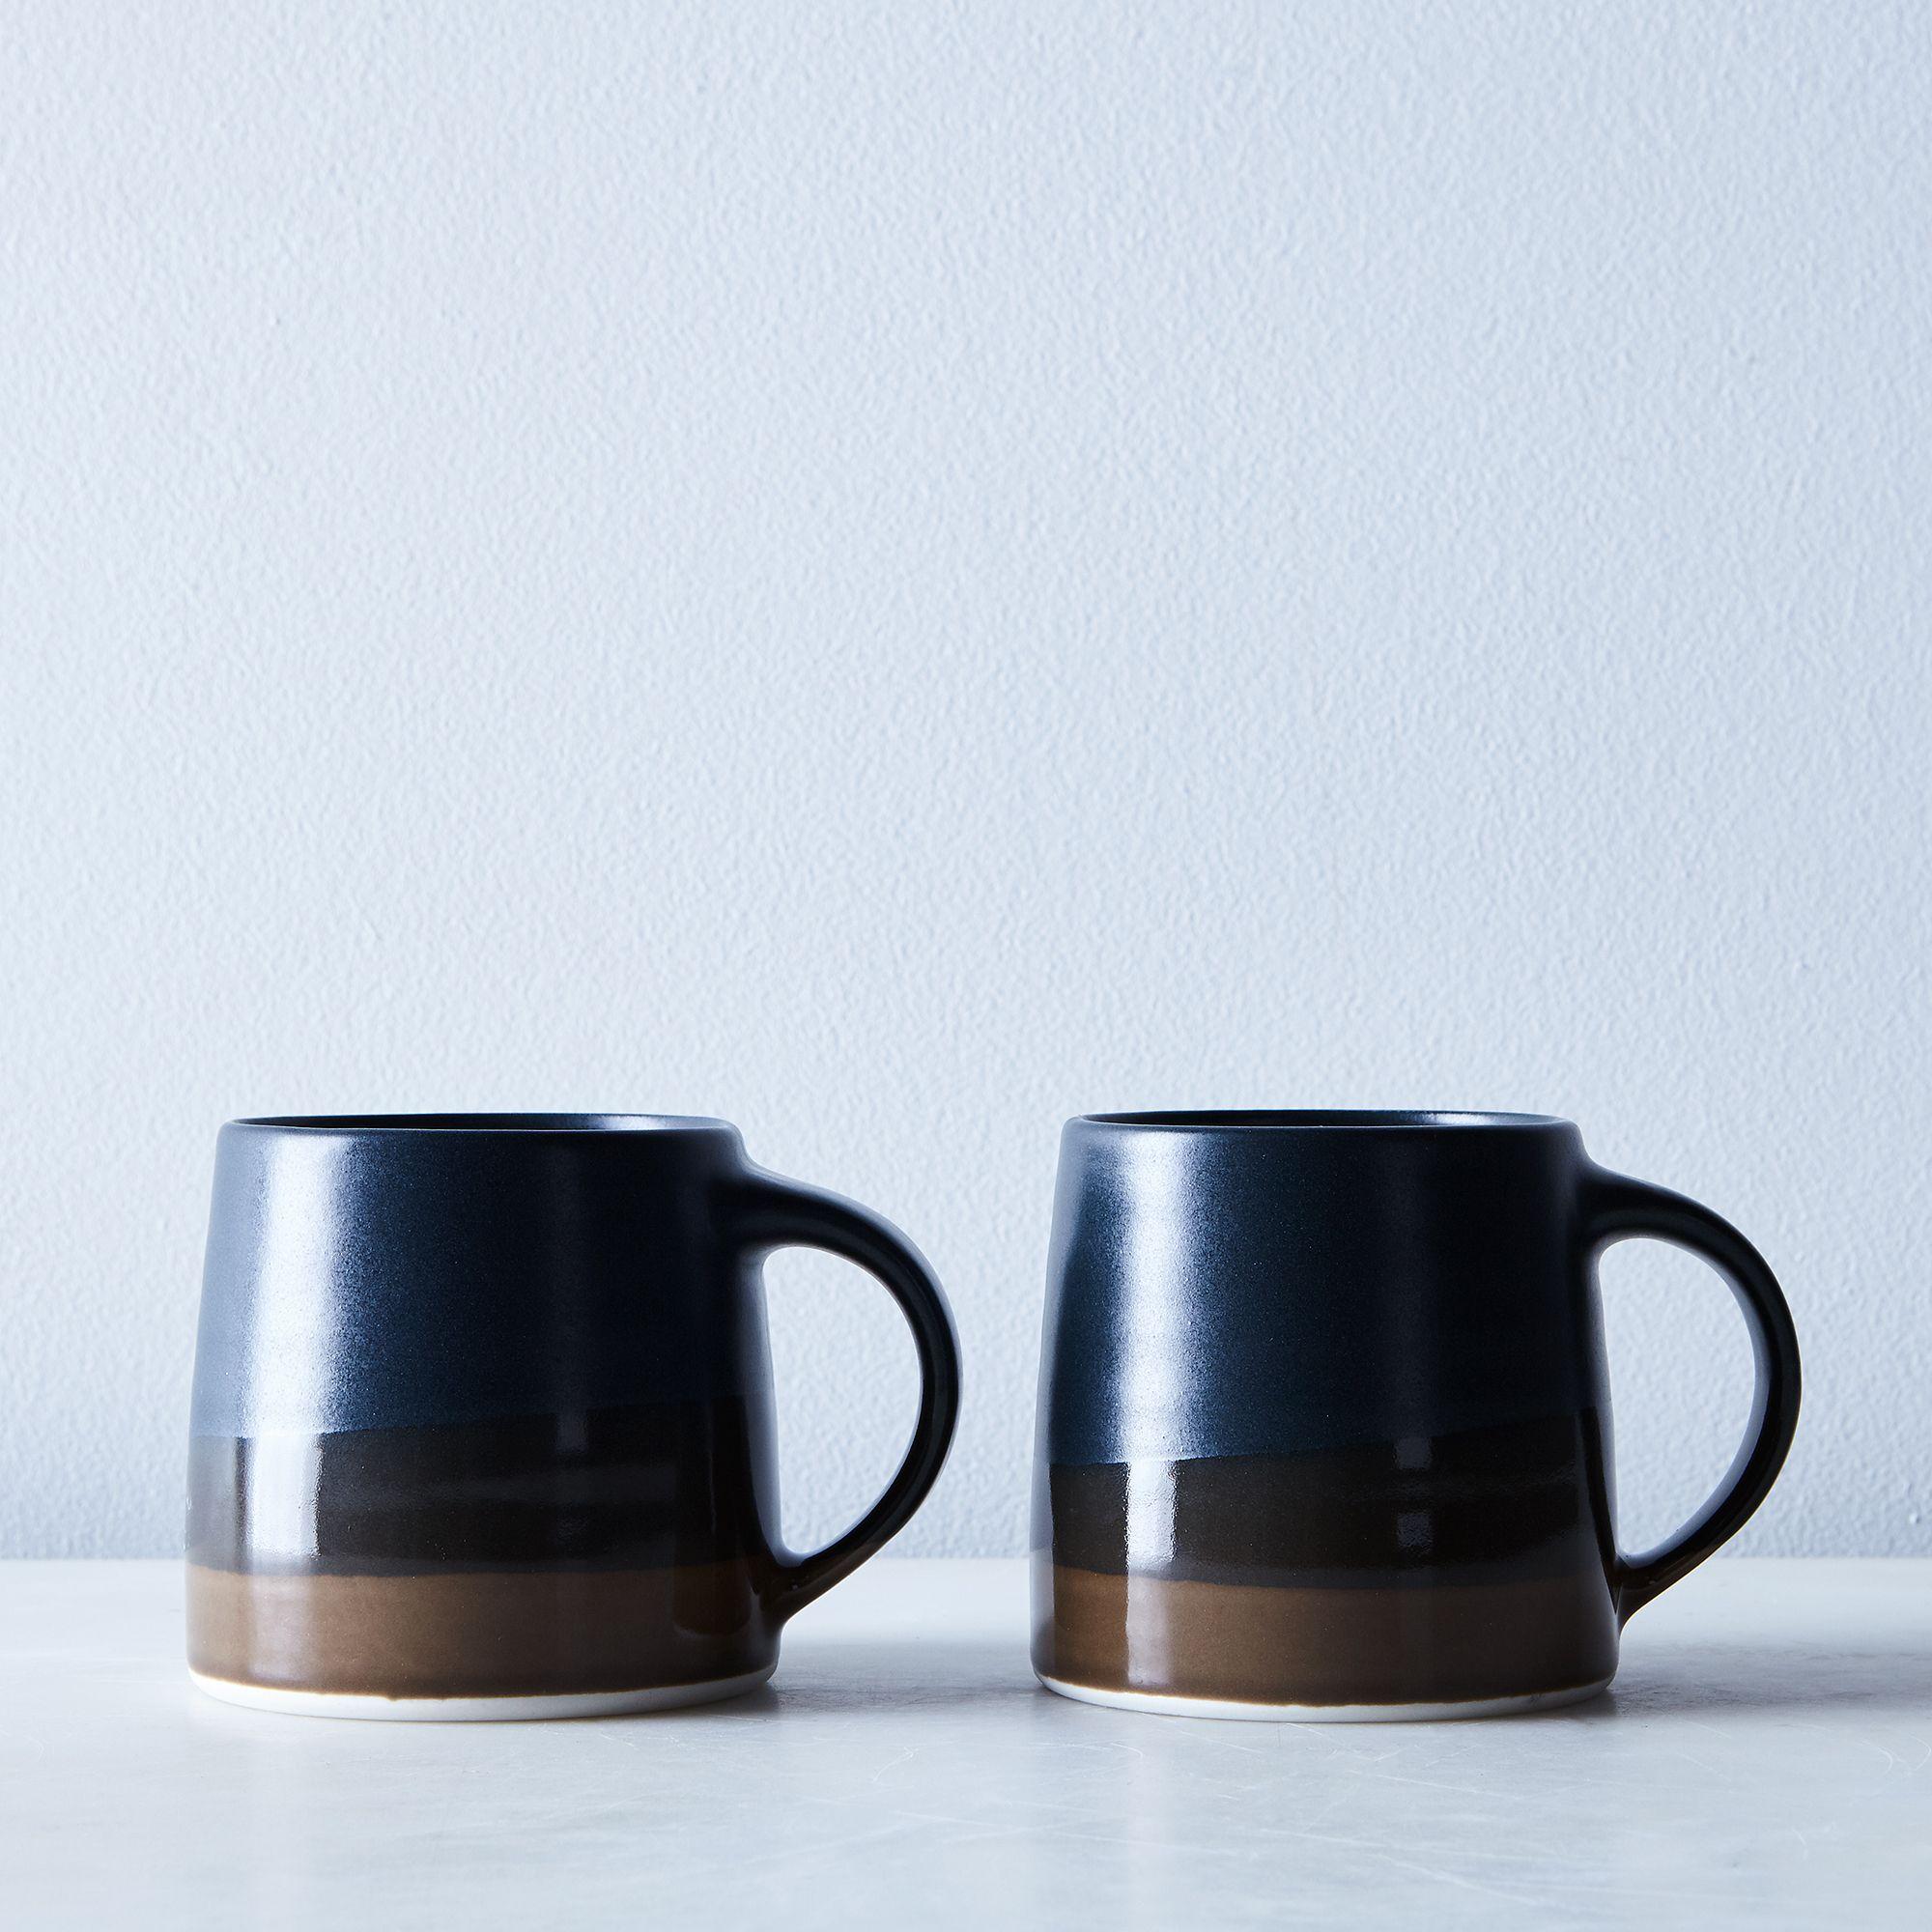 9012fe8c 0389 4e55 853d 1adee4f38b00  2017 0721 kinto color dipped mugs black and brown silo rocky luten 030